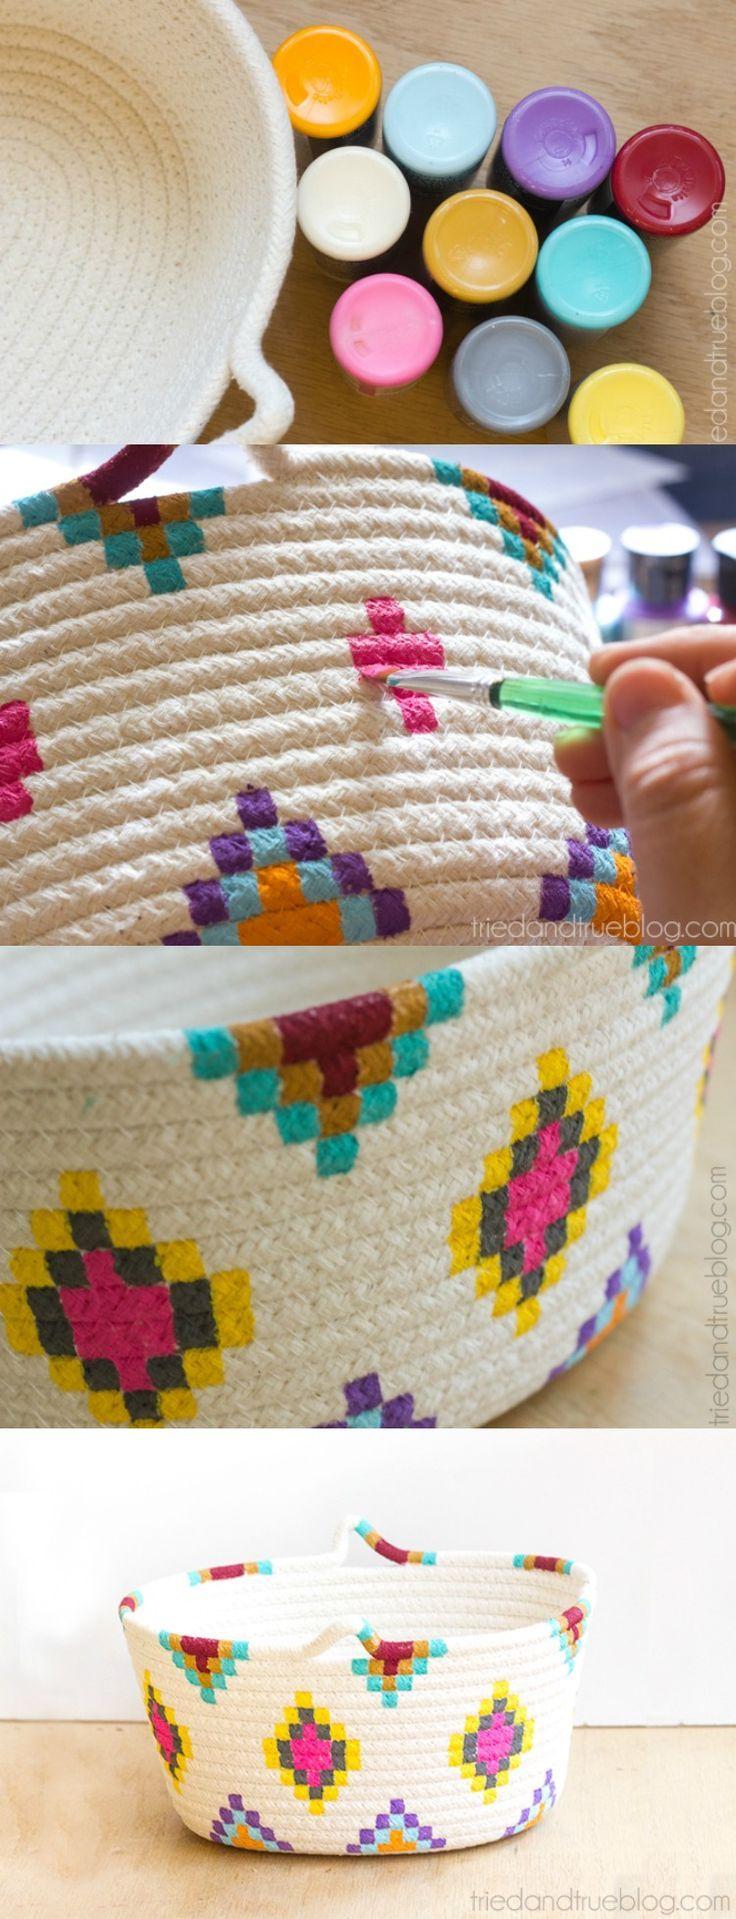 Handmade Gifts Ideas :Panier customisé à la peinture multicolore / Kilim-Inspired painted basket tut...  https://diypick.com/lifehacks/diy-gifts/handmade-gifts-ideas-panier-customise-a-la-peinture-multicolore-kilim-inspired-painted-basket-tut/